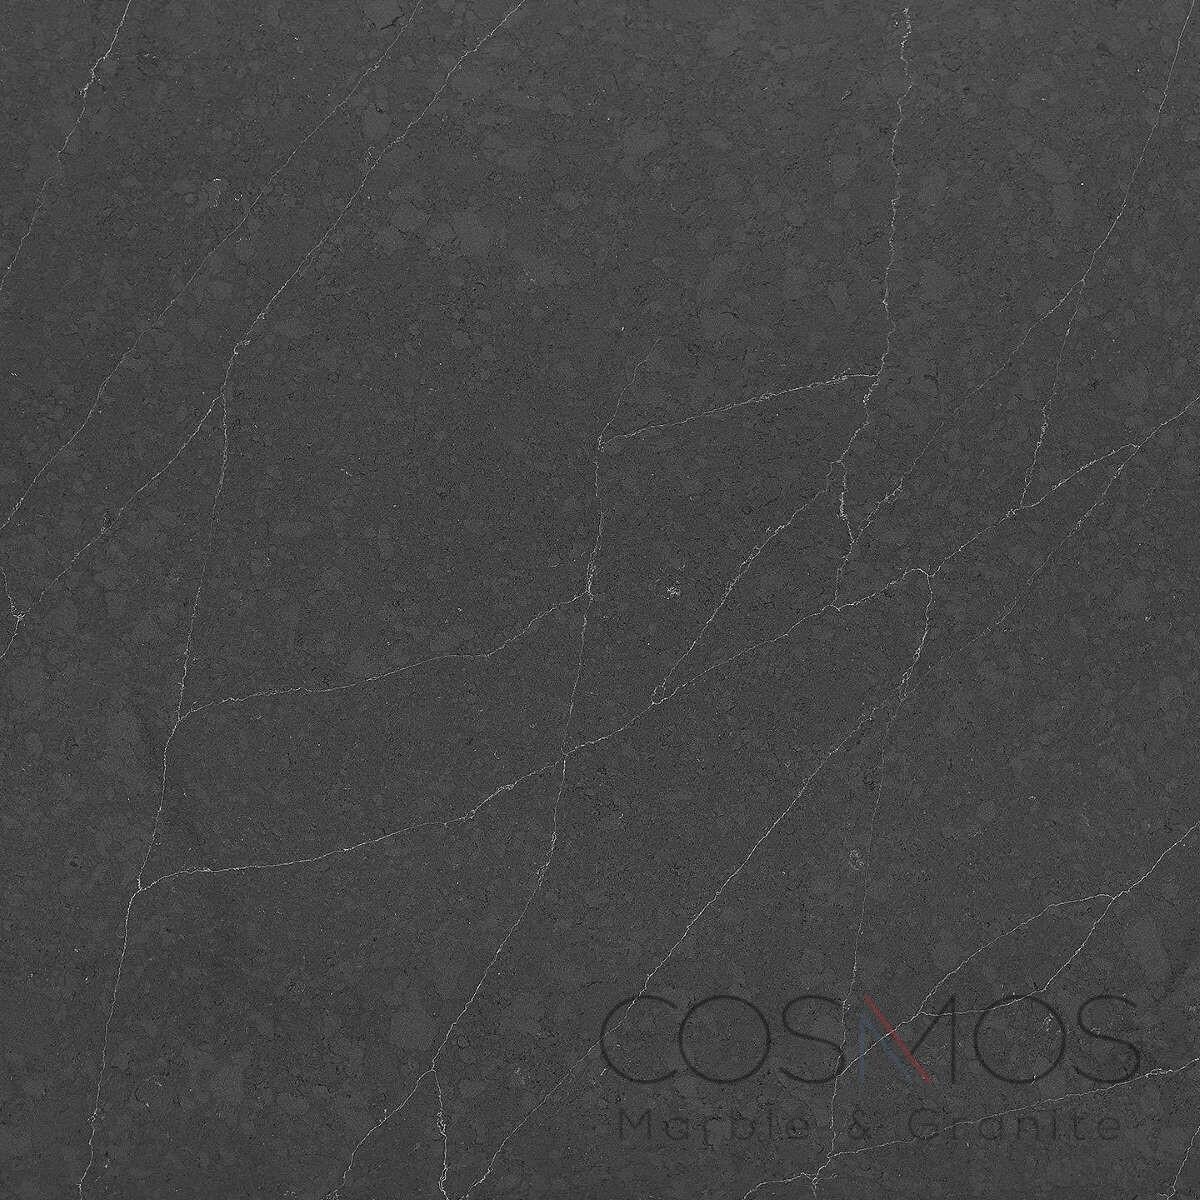 corianquartz-nero-soapstone